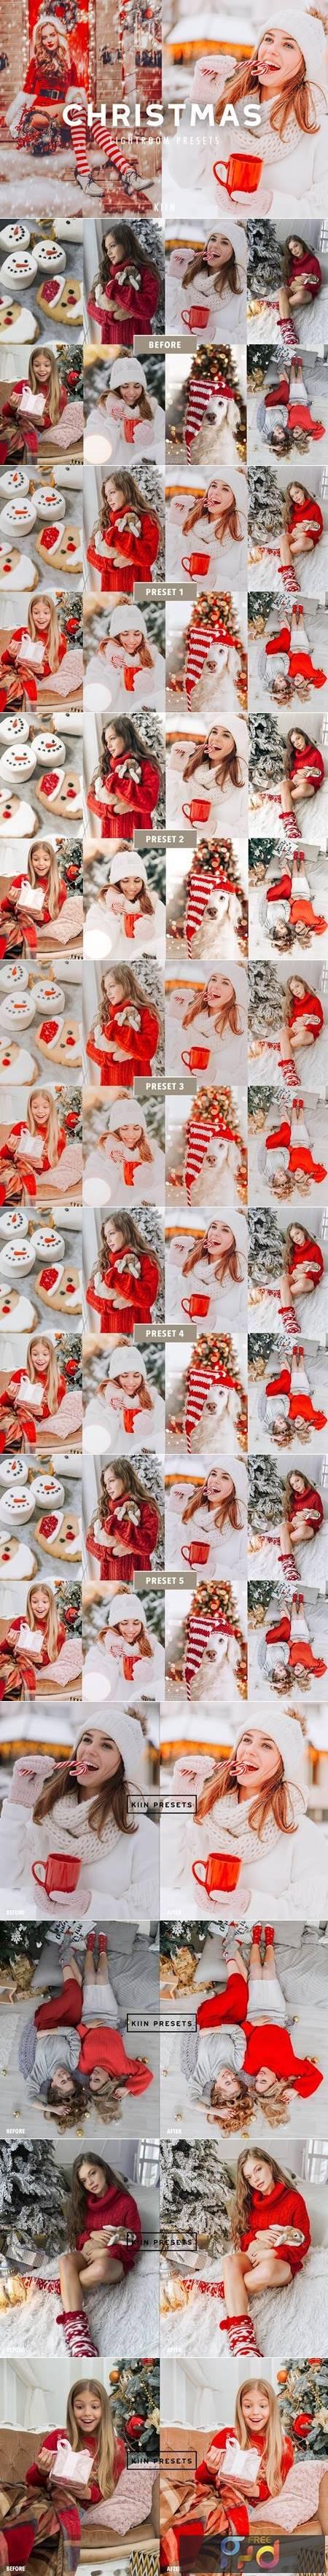 5 CHRISTMAS LIGHTROOM PRESETS 5626137 1